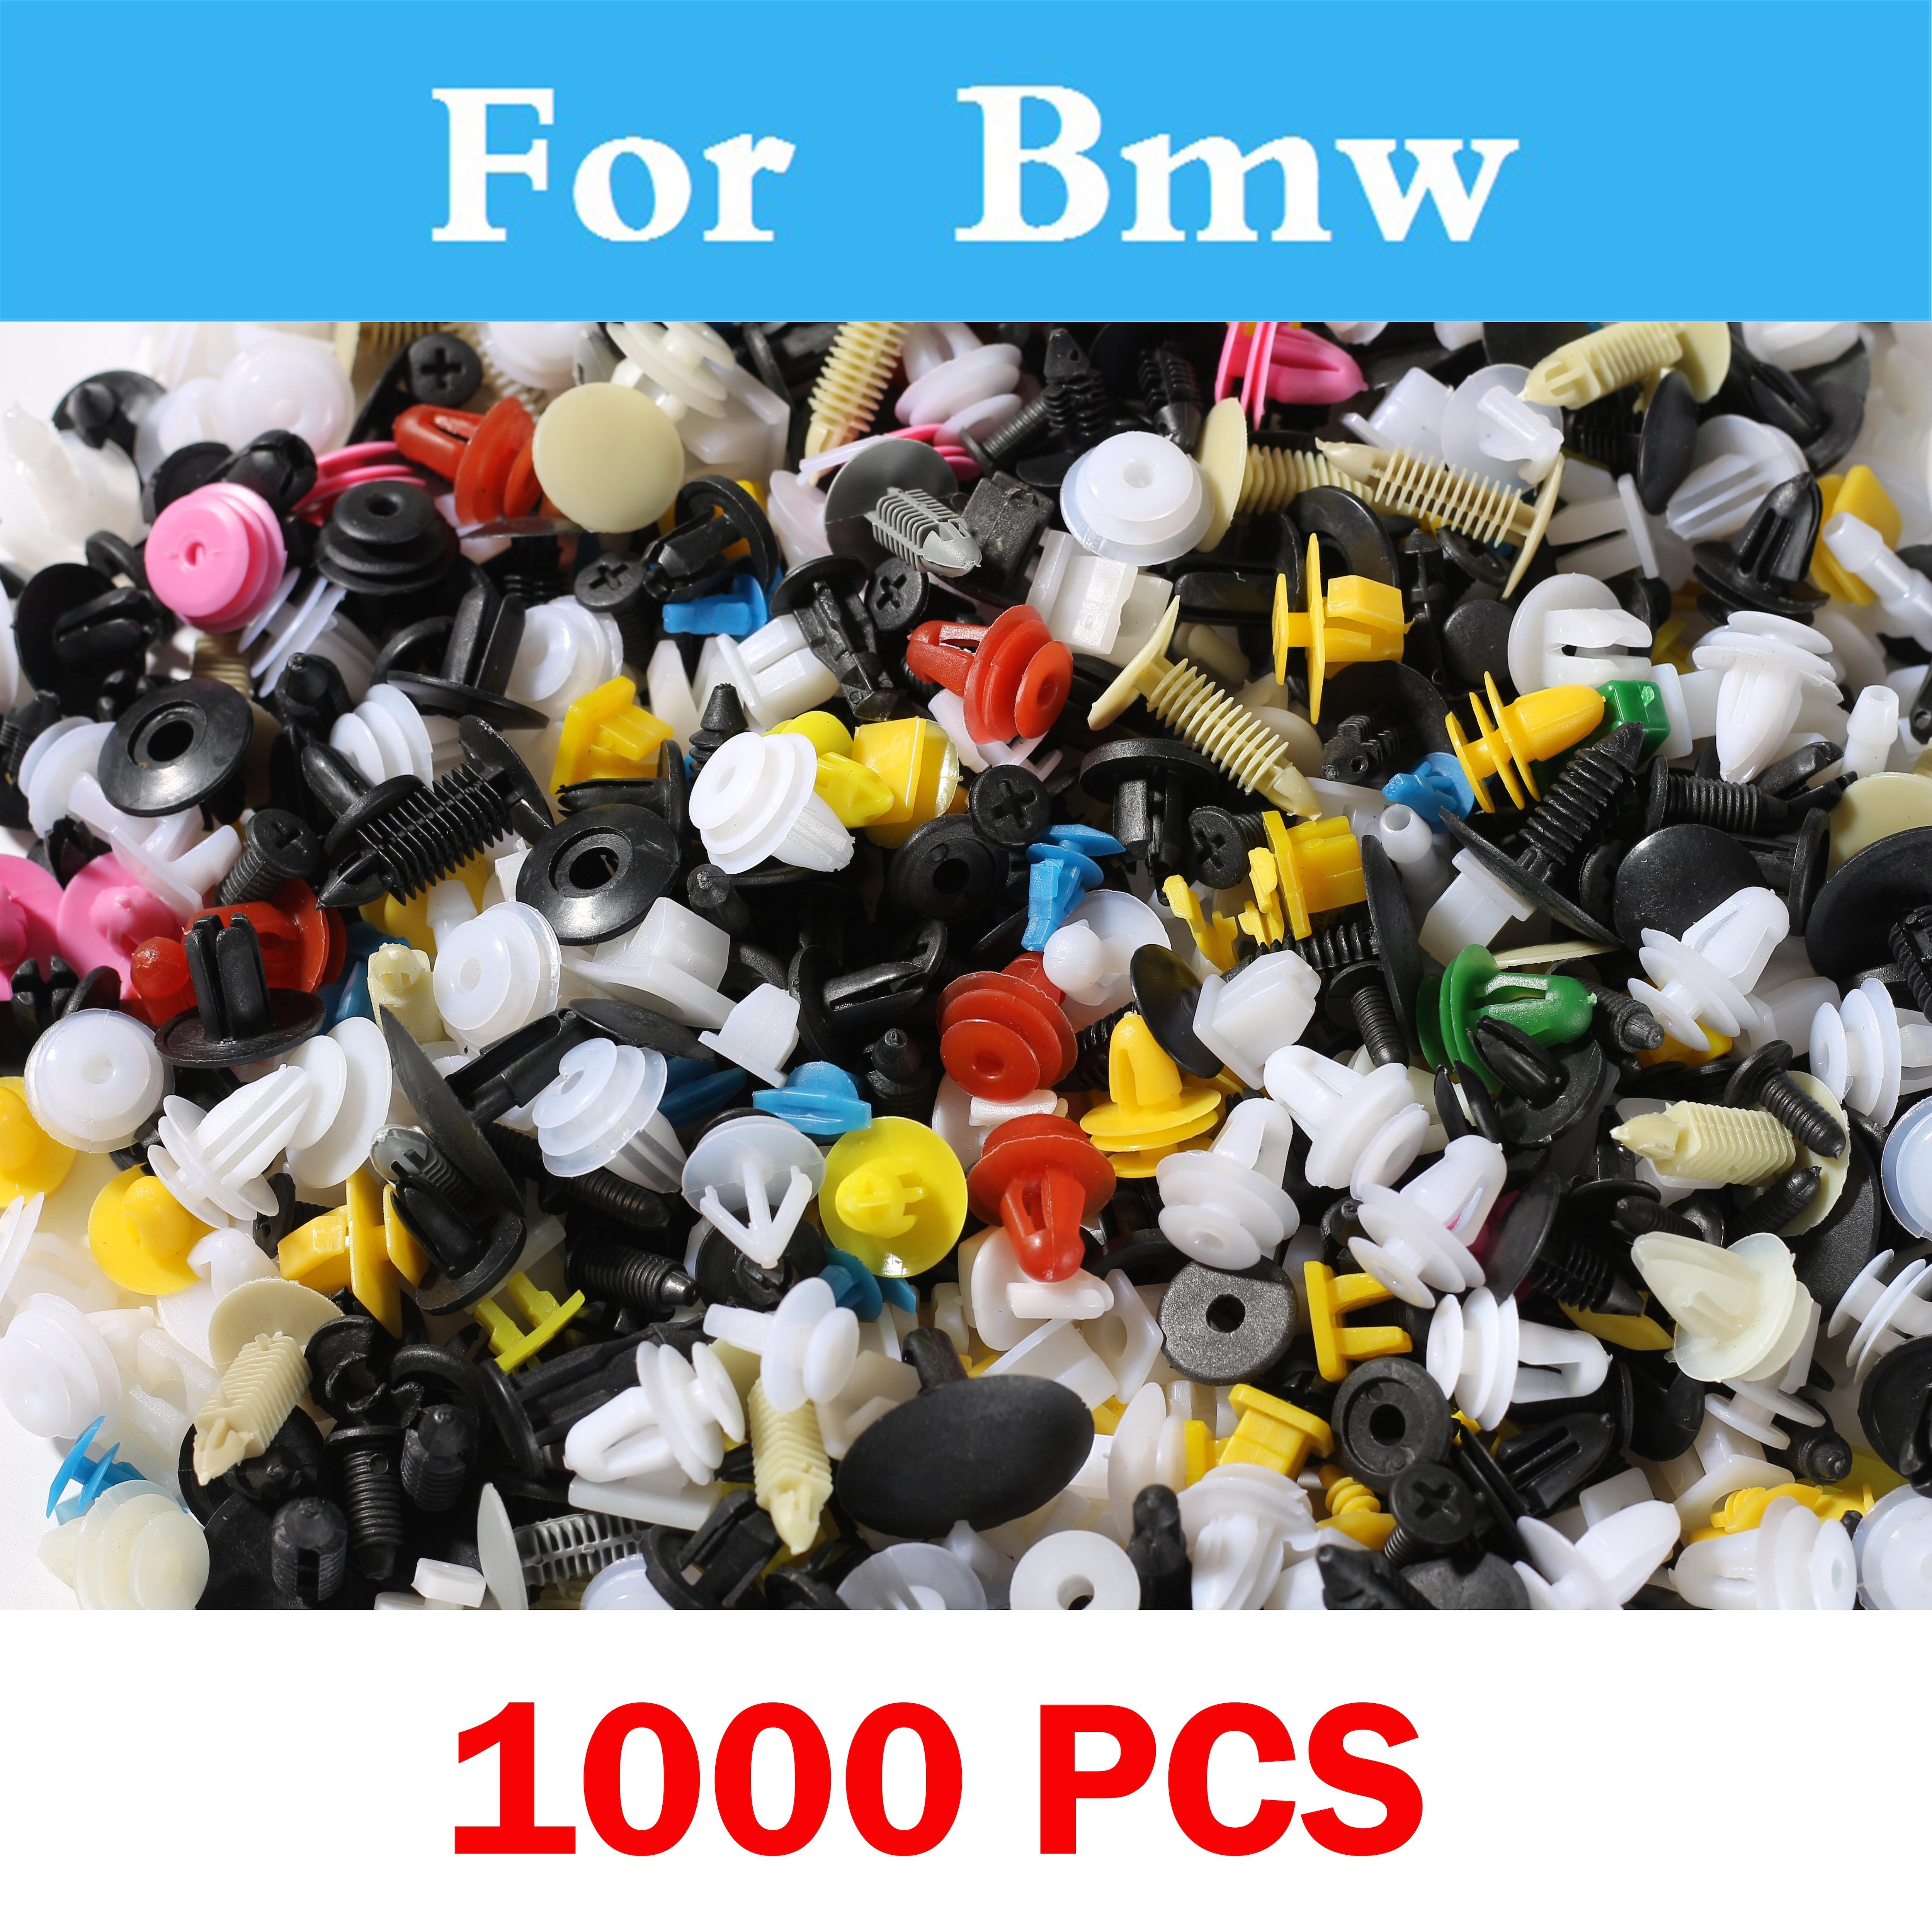 1000pcs Car Styling Mixed Door Trim Panel Push Retainer Bumper Clips General For Bmw F10 F20 Gt E46 E36 F30 X1 X3 X5 X6 E90 E60